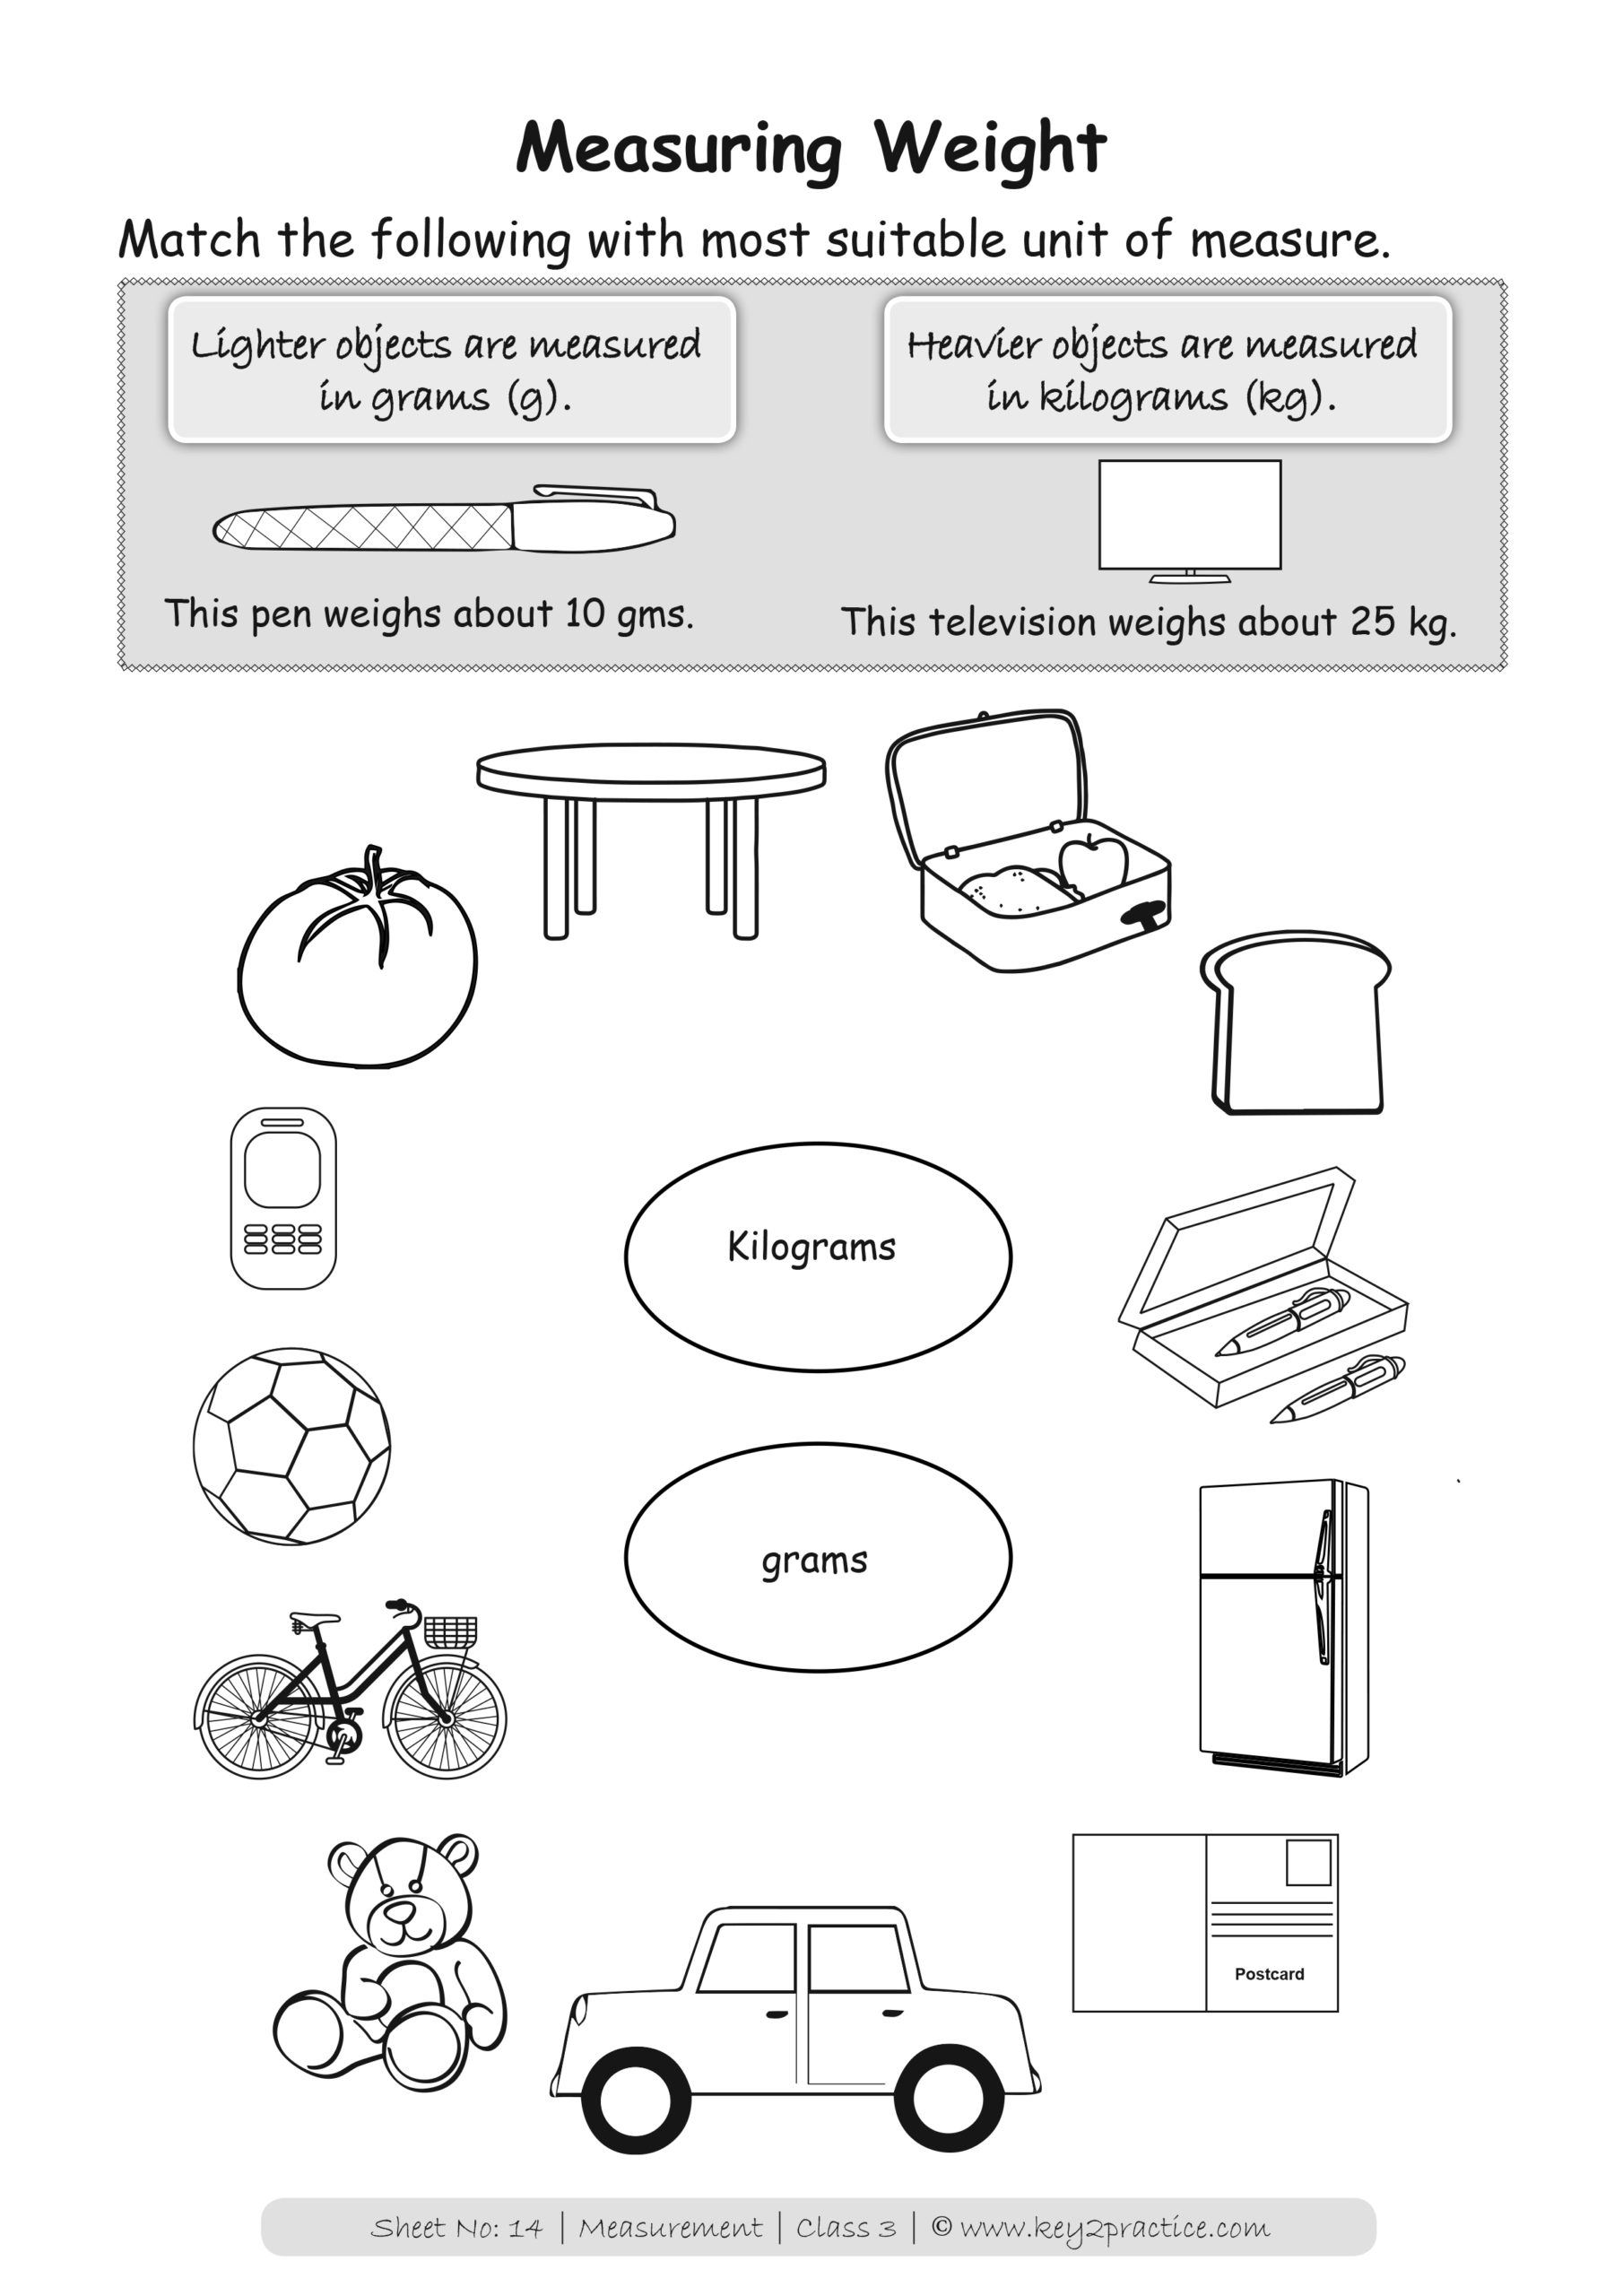 hight resolution of Measurements Worksheets I Maths Grade 3 - key2practice Workbooks